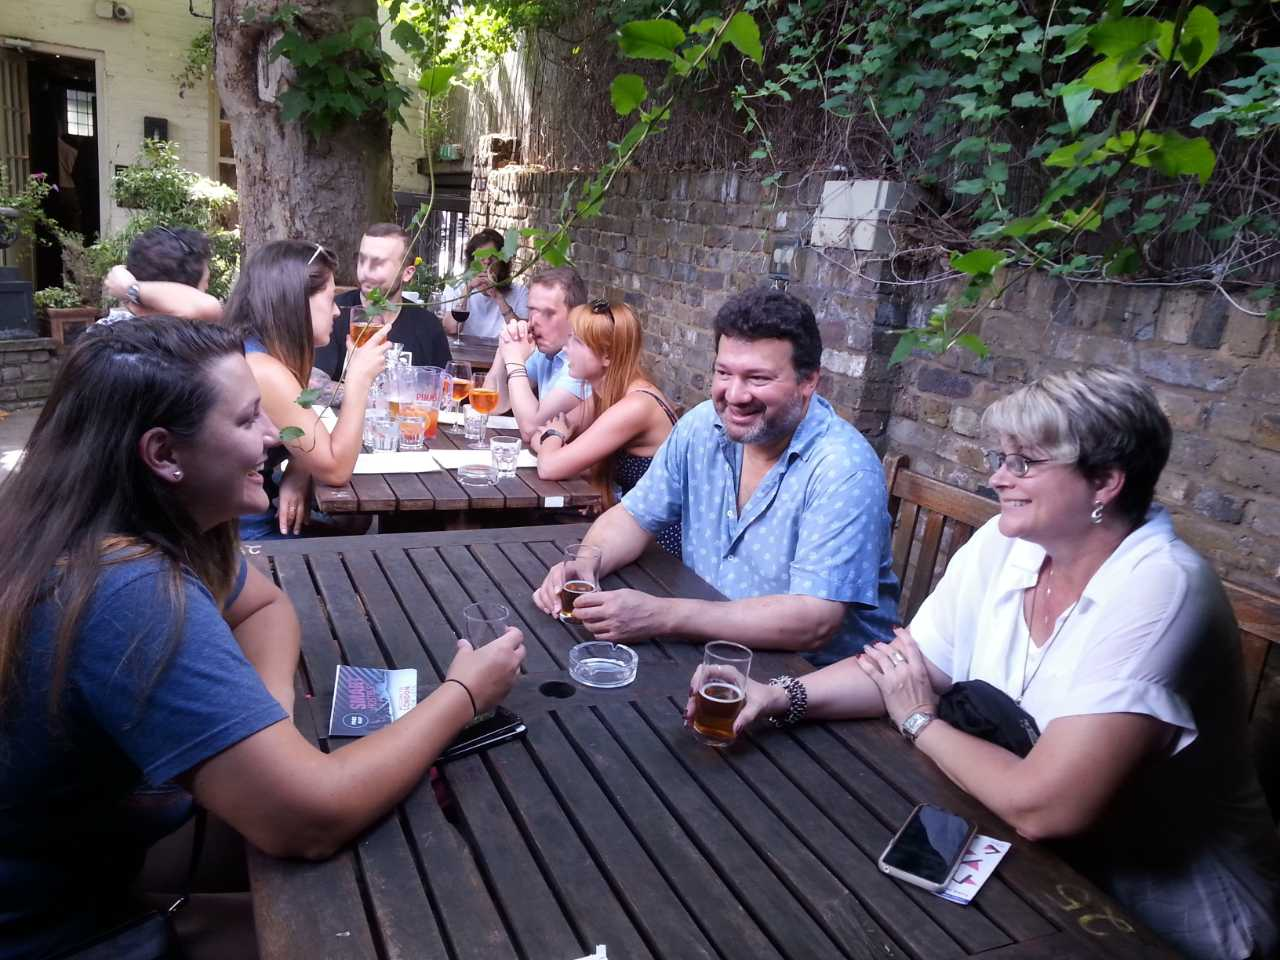 Pub Tour of Notting Hill and Kensington